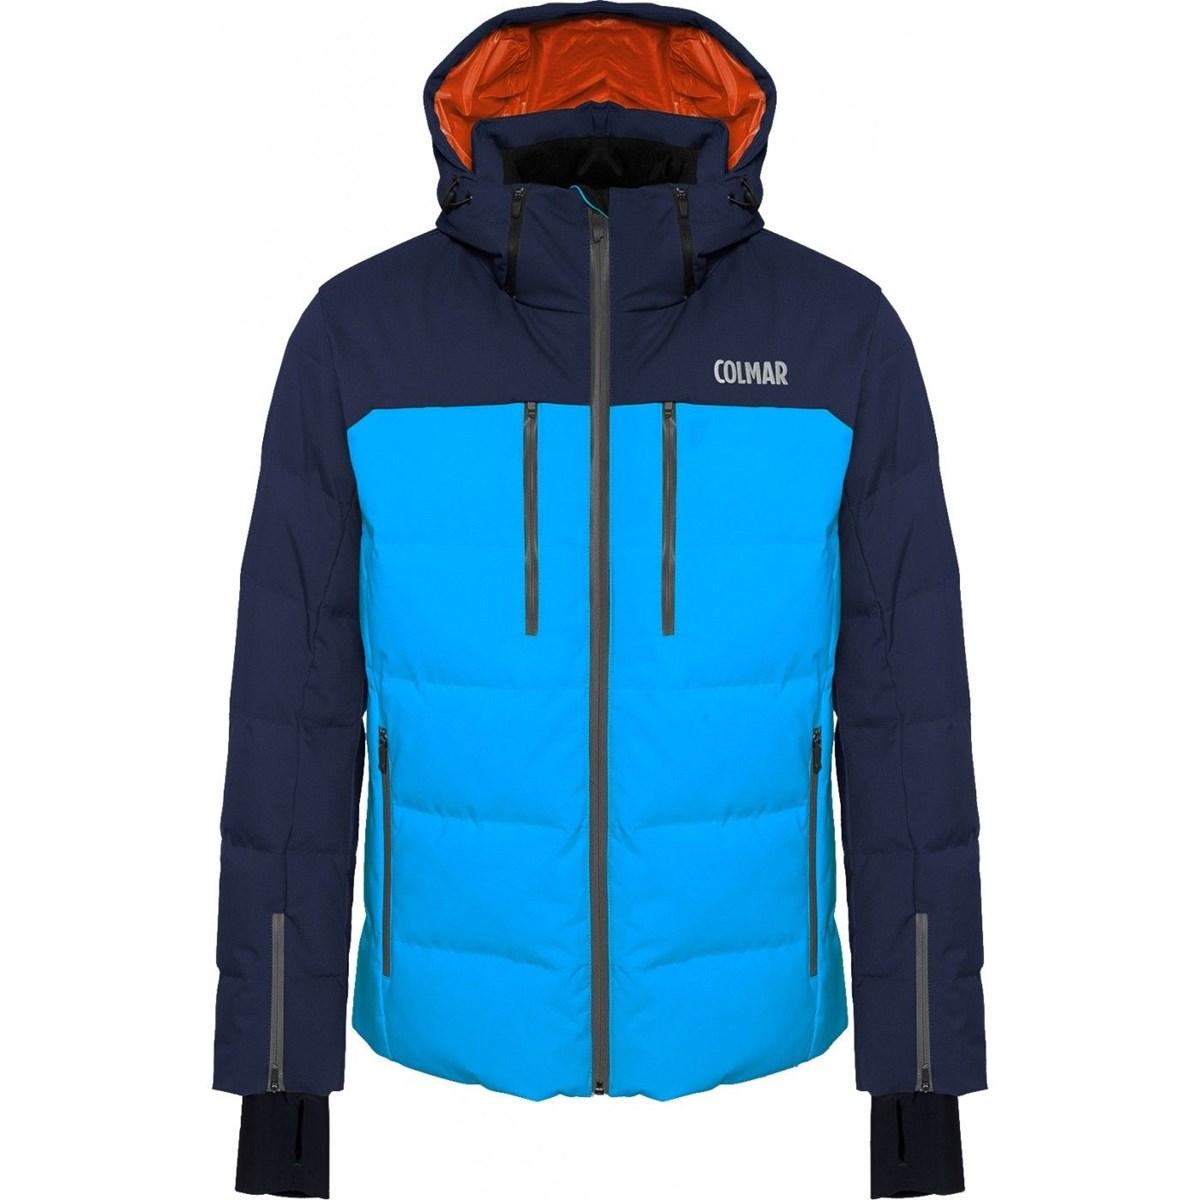 0382425cf6f Colmar Chamonix Mens Down Ski Jacket 2019 Mirage   Blue Black £350.00